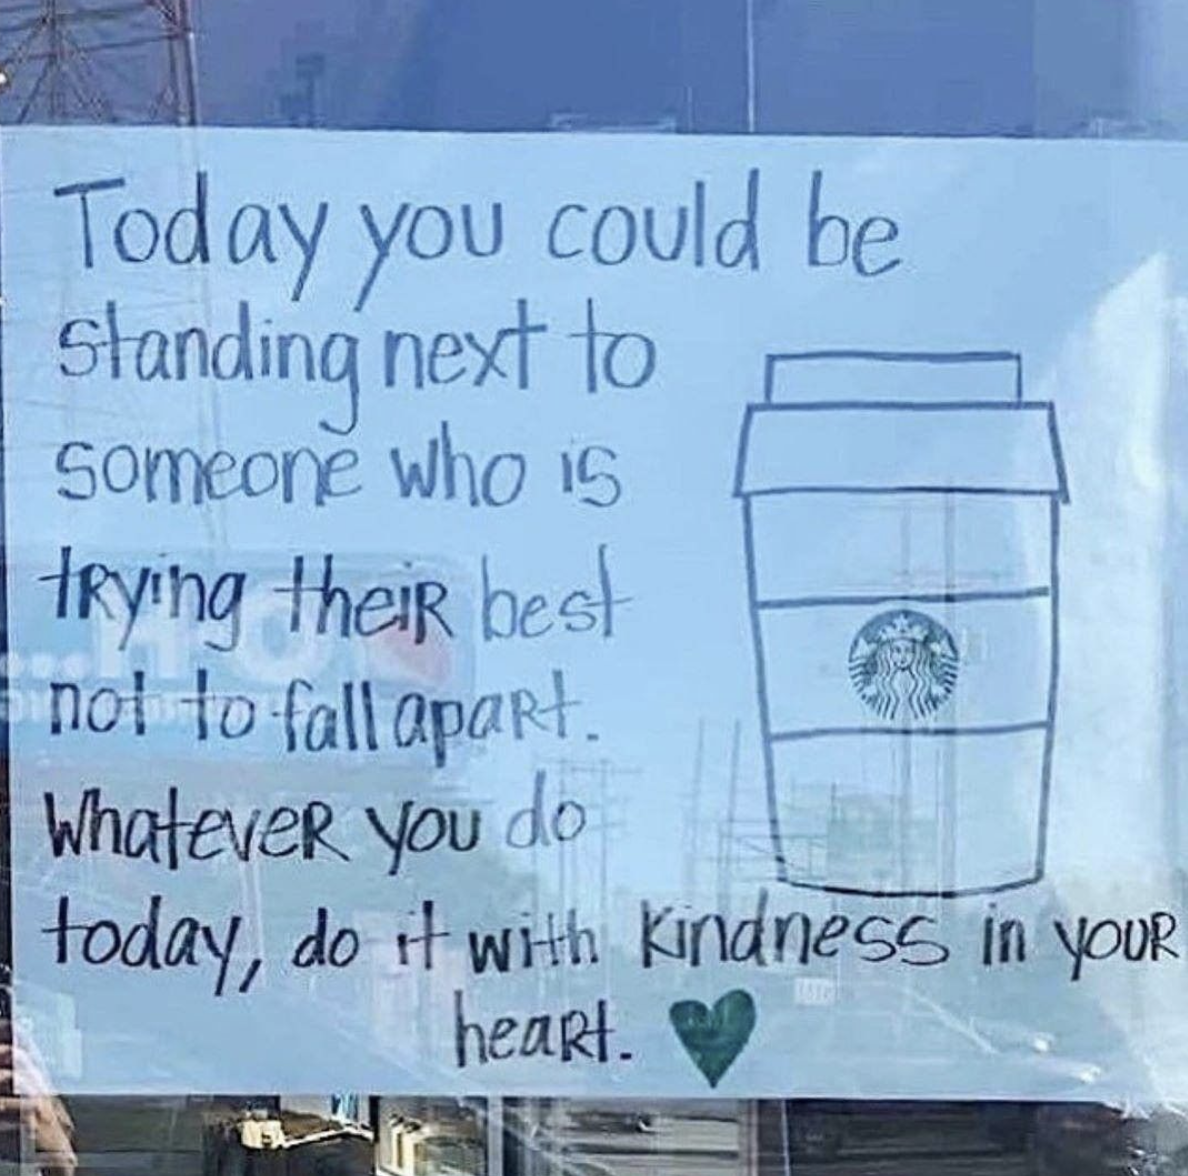 [Image] Make kindness your lifestyle.